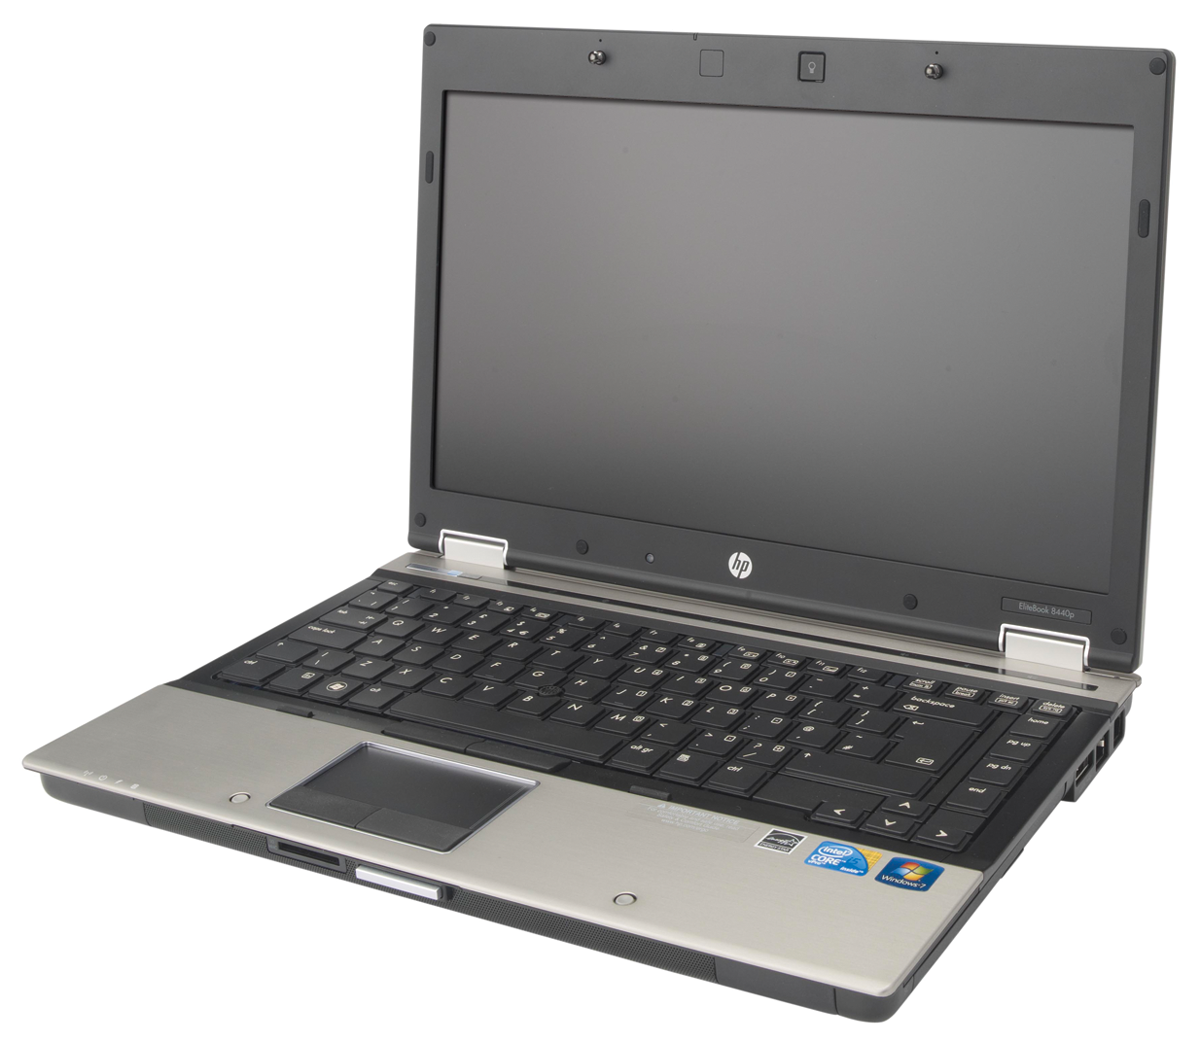 LAPTOP HP Elitebook 8440p Core i5-520 2.9GHz / RAM 2GB / HDD 250GB